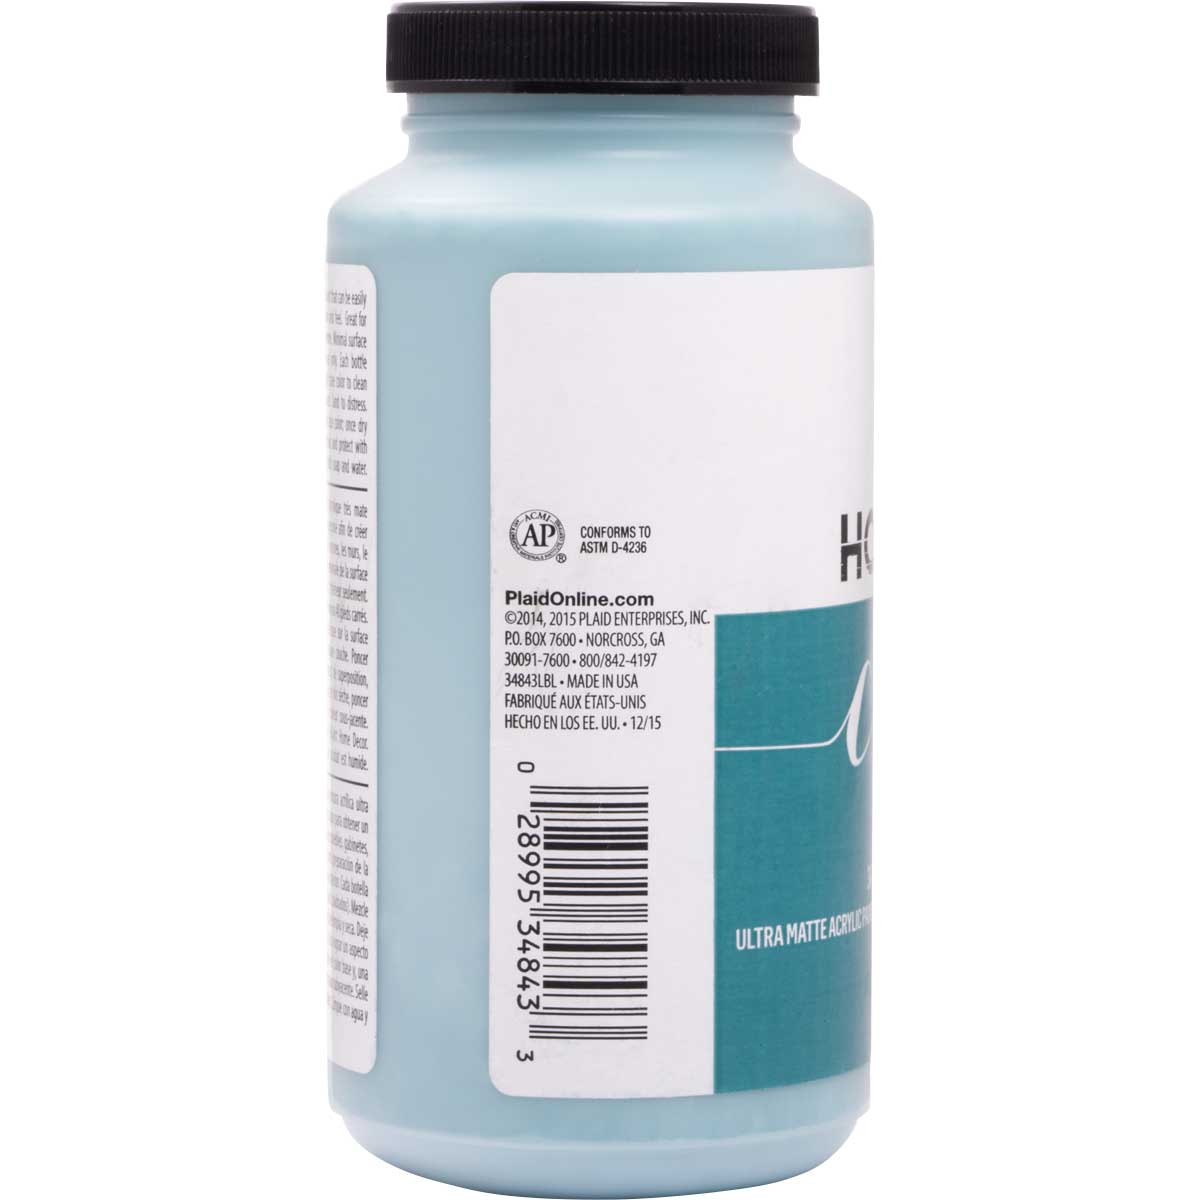 FolkArt ® Home Decor™ Chalk - Cascade, 16 oz. - 34843